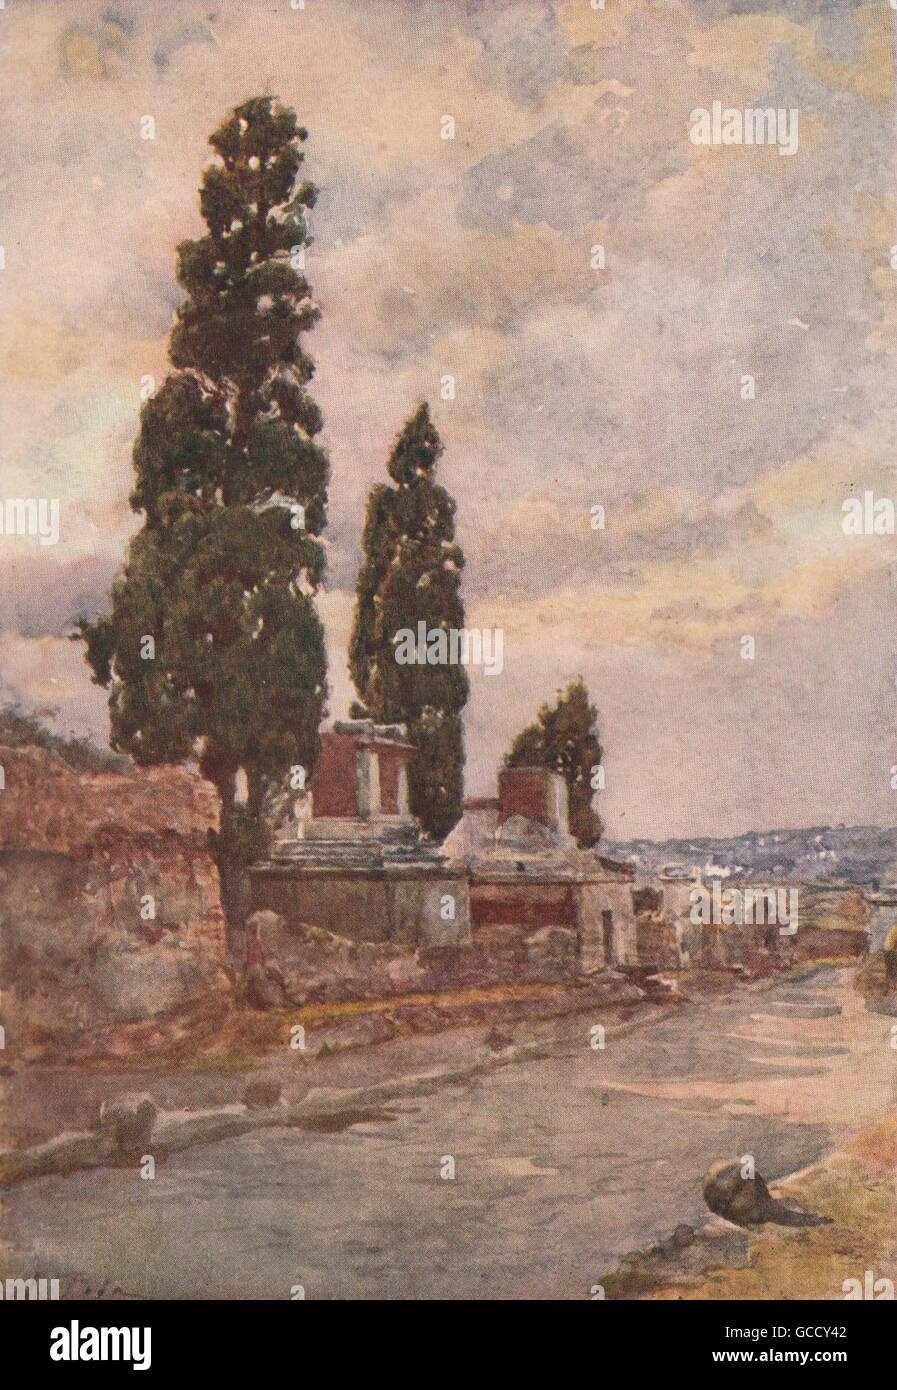 Entrance to the Triangular Forum POMPEII By Alberto Pisa 1910 old print